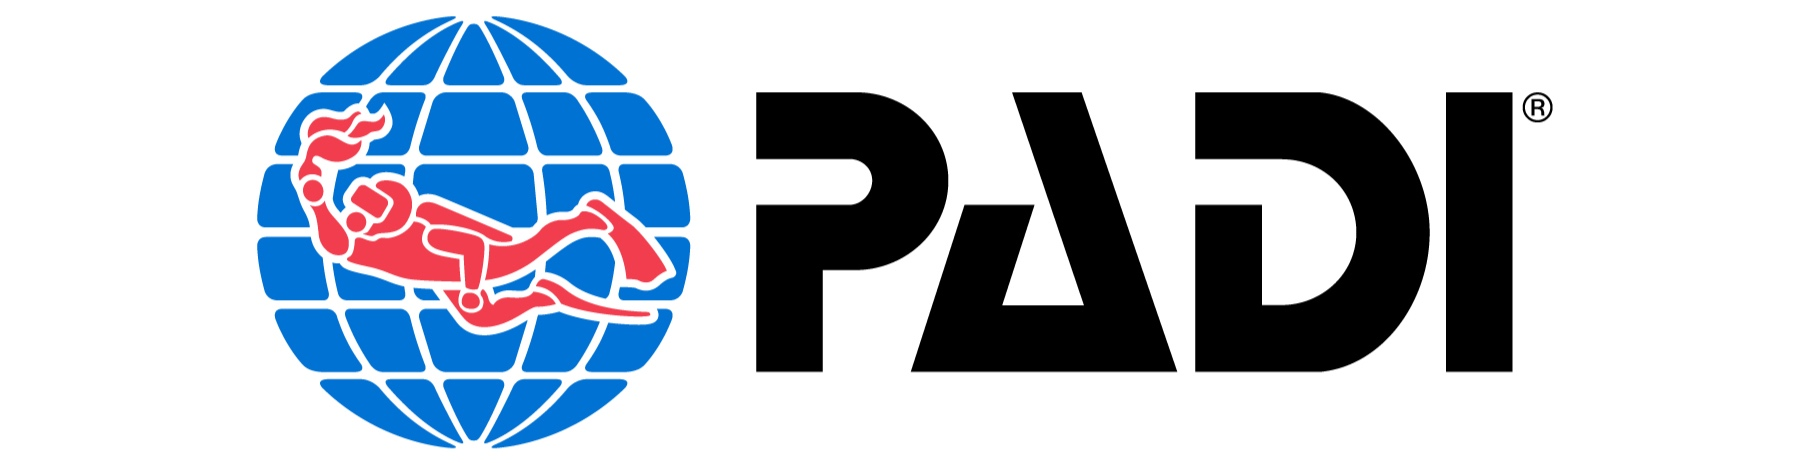 PADI_logo_RGB_300dpi-01.jpg